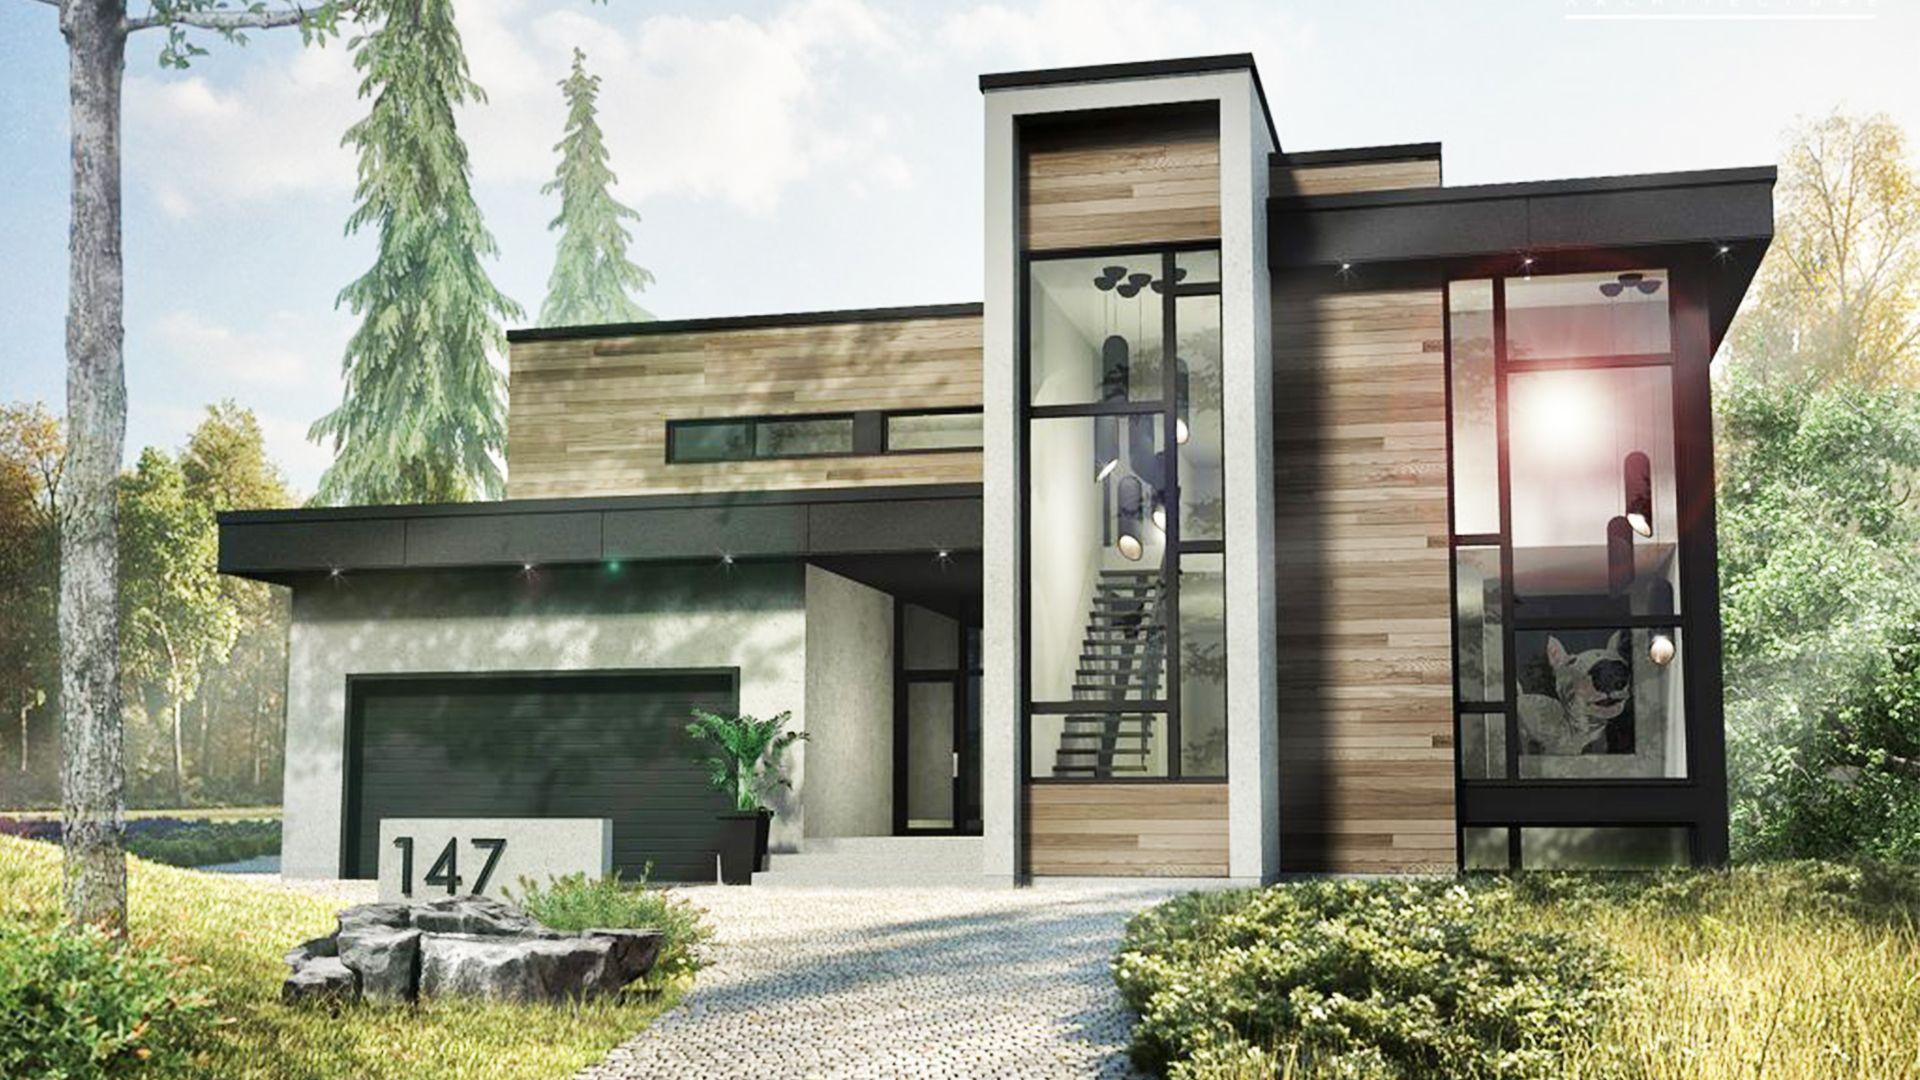 2 Story Modern House Style 53x47 Diy Patio House Styles